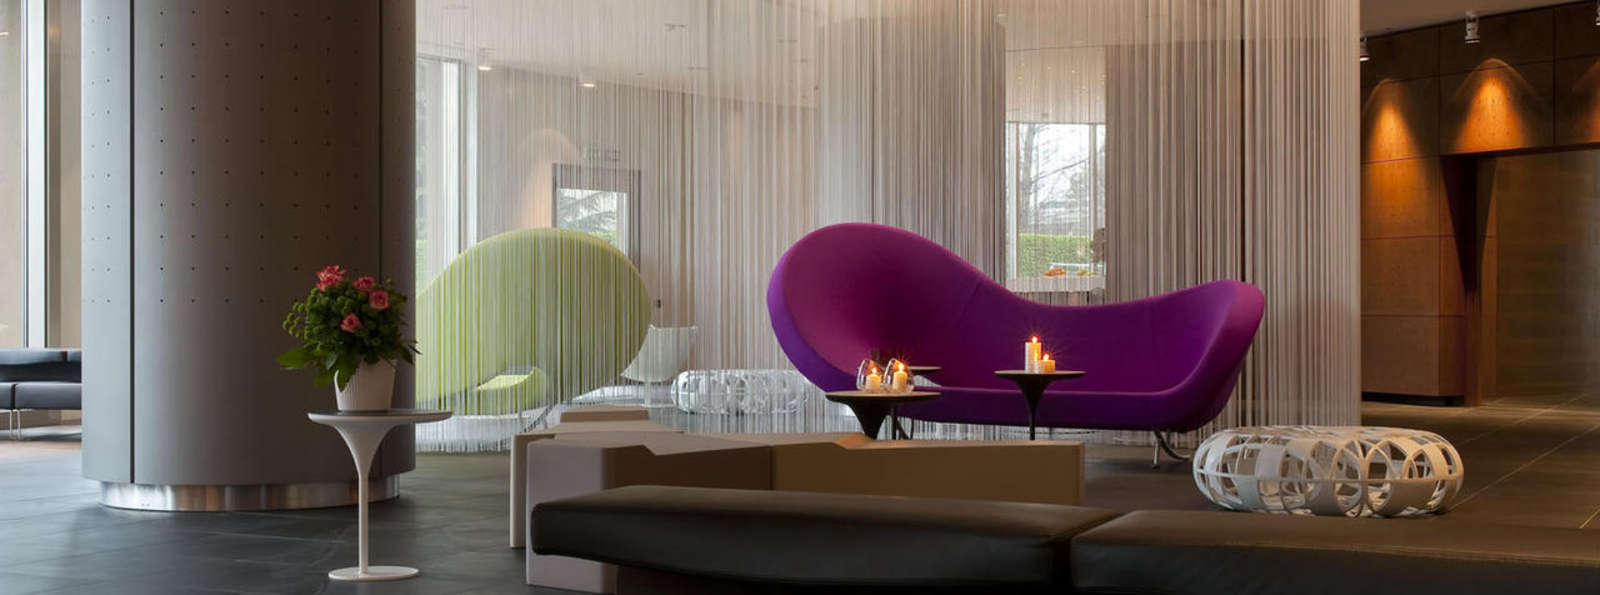 The Hub Hotel - The_Hub_Hotel_Salone.jpg